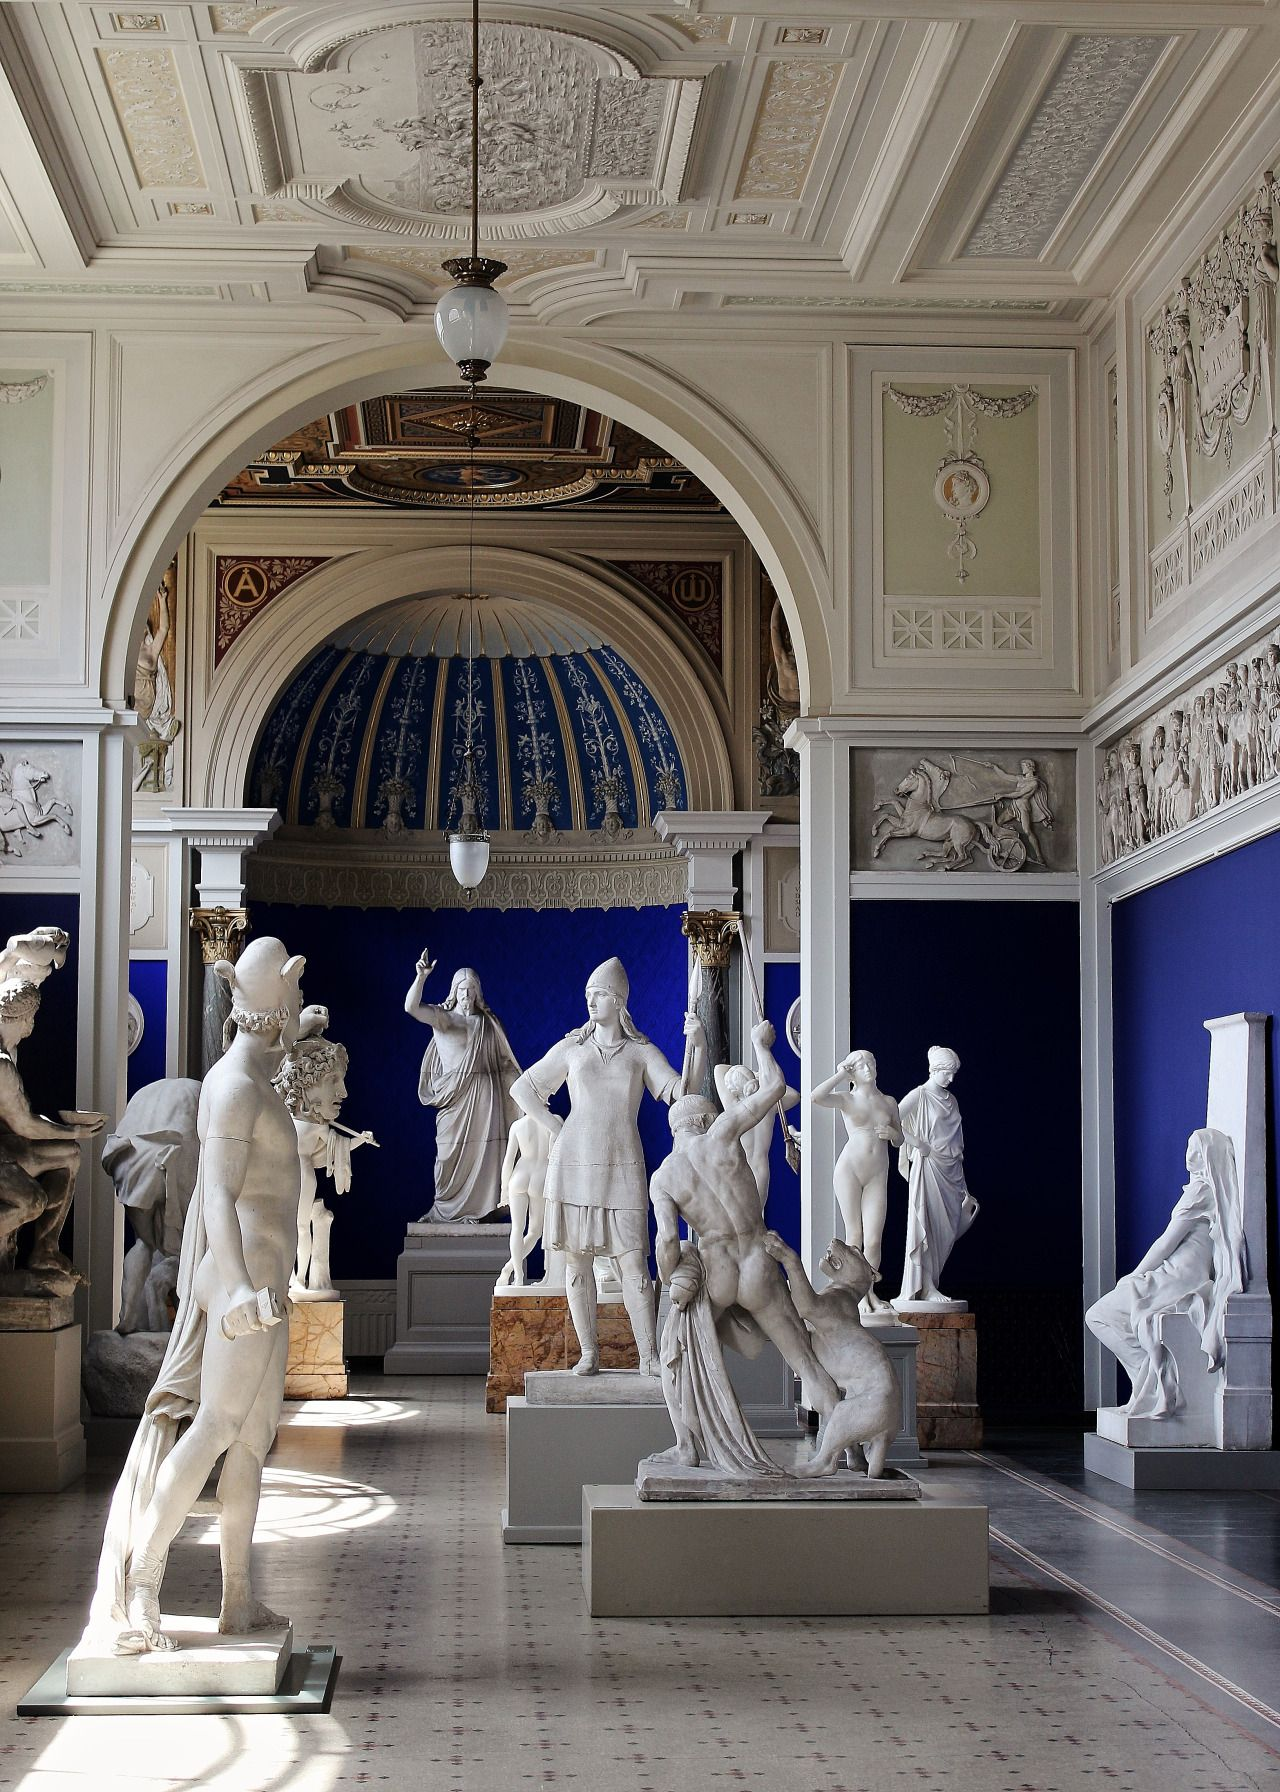 Sculpture Gallery. Ny Carlsberg Glyptotek Museum ...